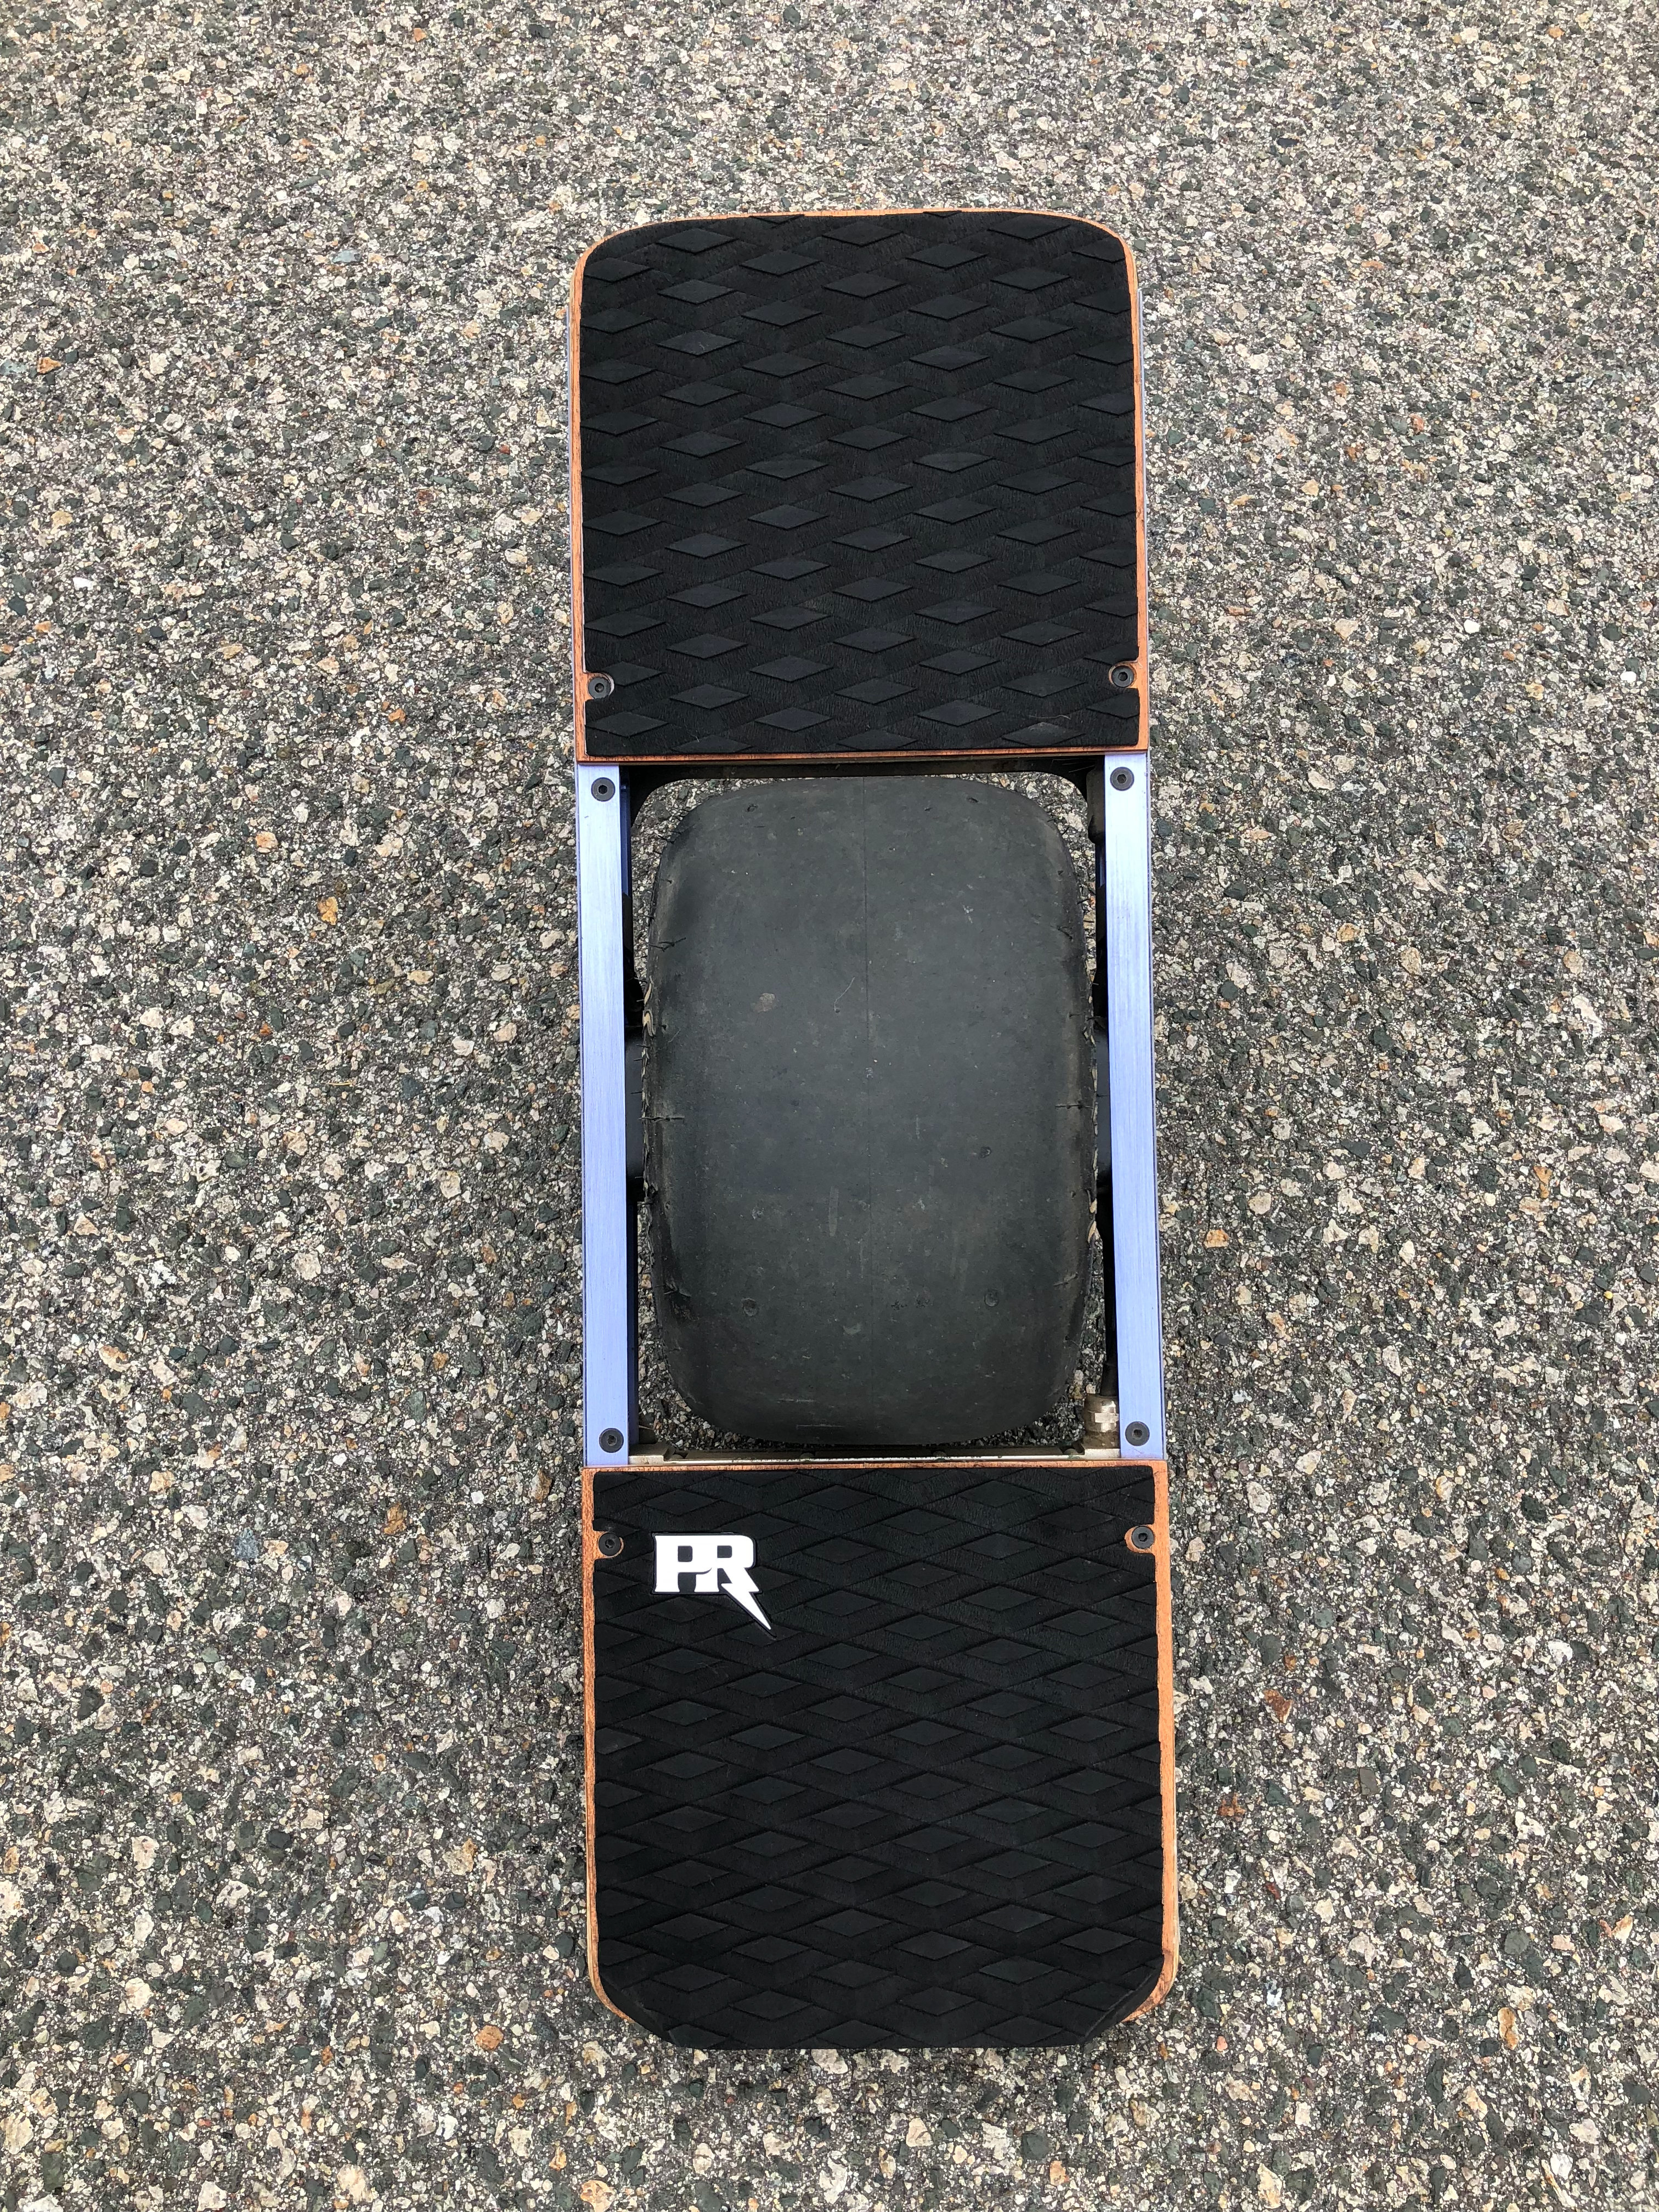 Onewheel cobra pad